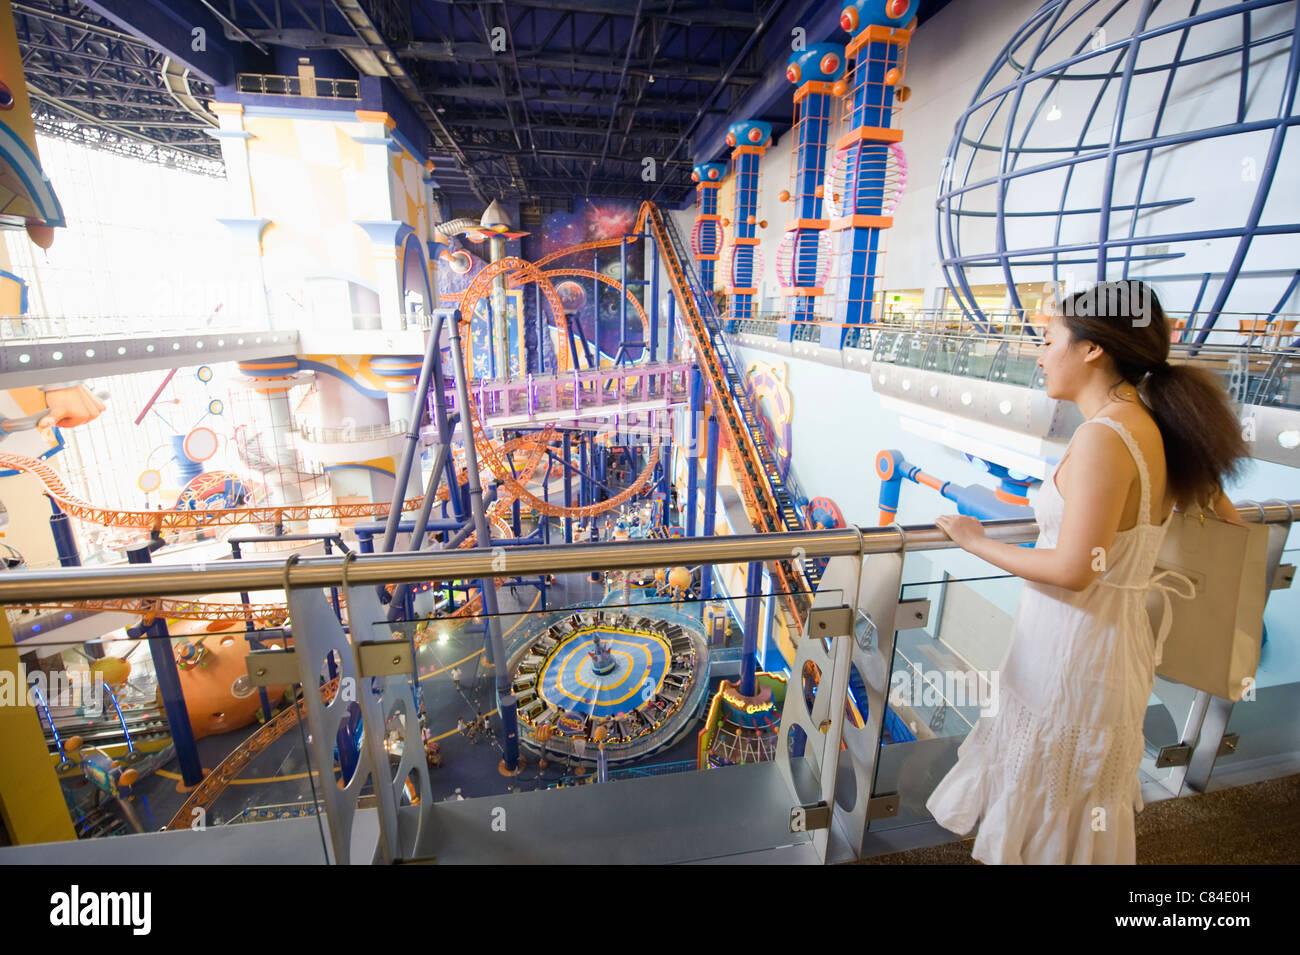 Malaysia kuala lumpur berjaya times stock photos malaysia kuala cosmos world theme park in berjaya times square shopping mall kuala lumpur malaysia publicscrutiny Images